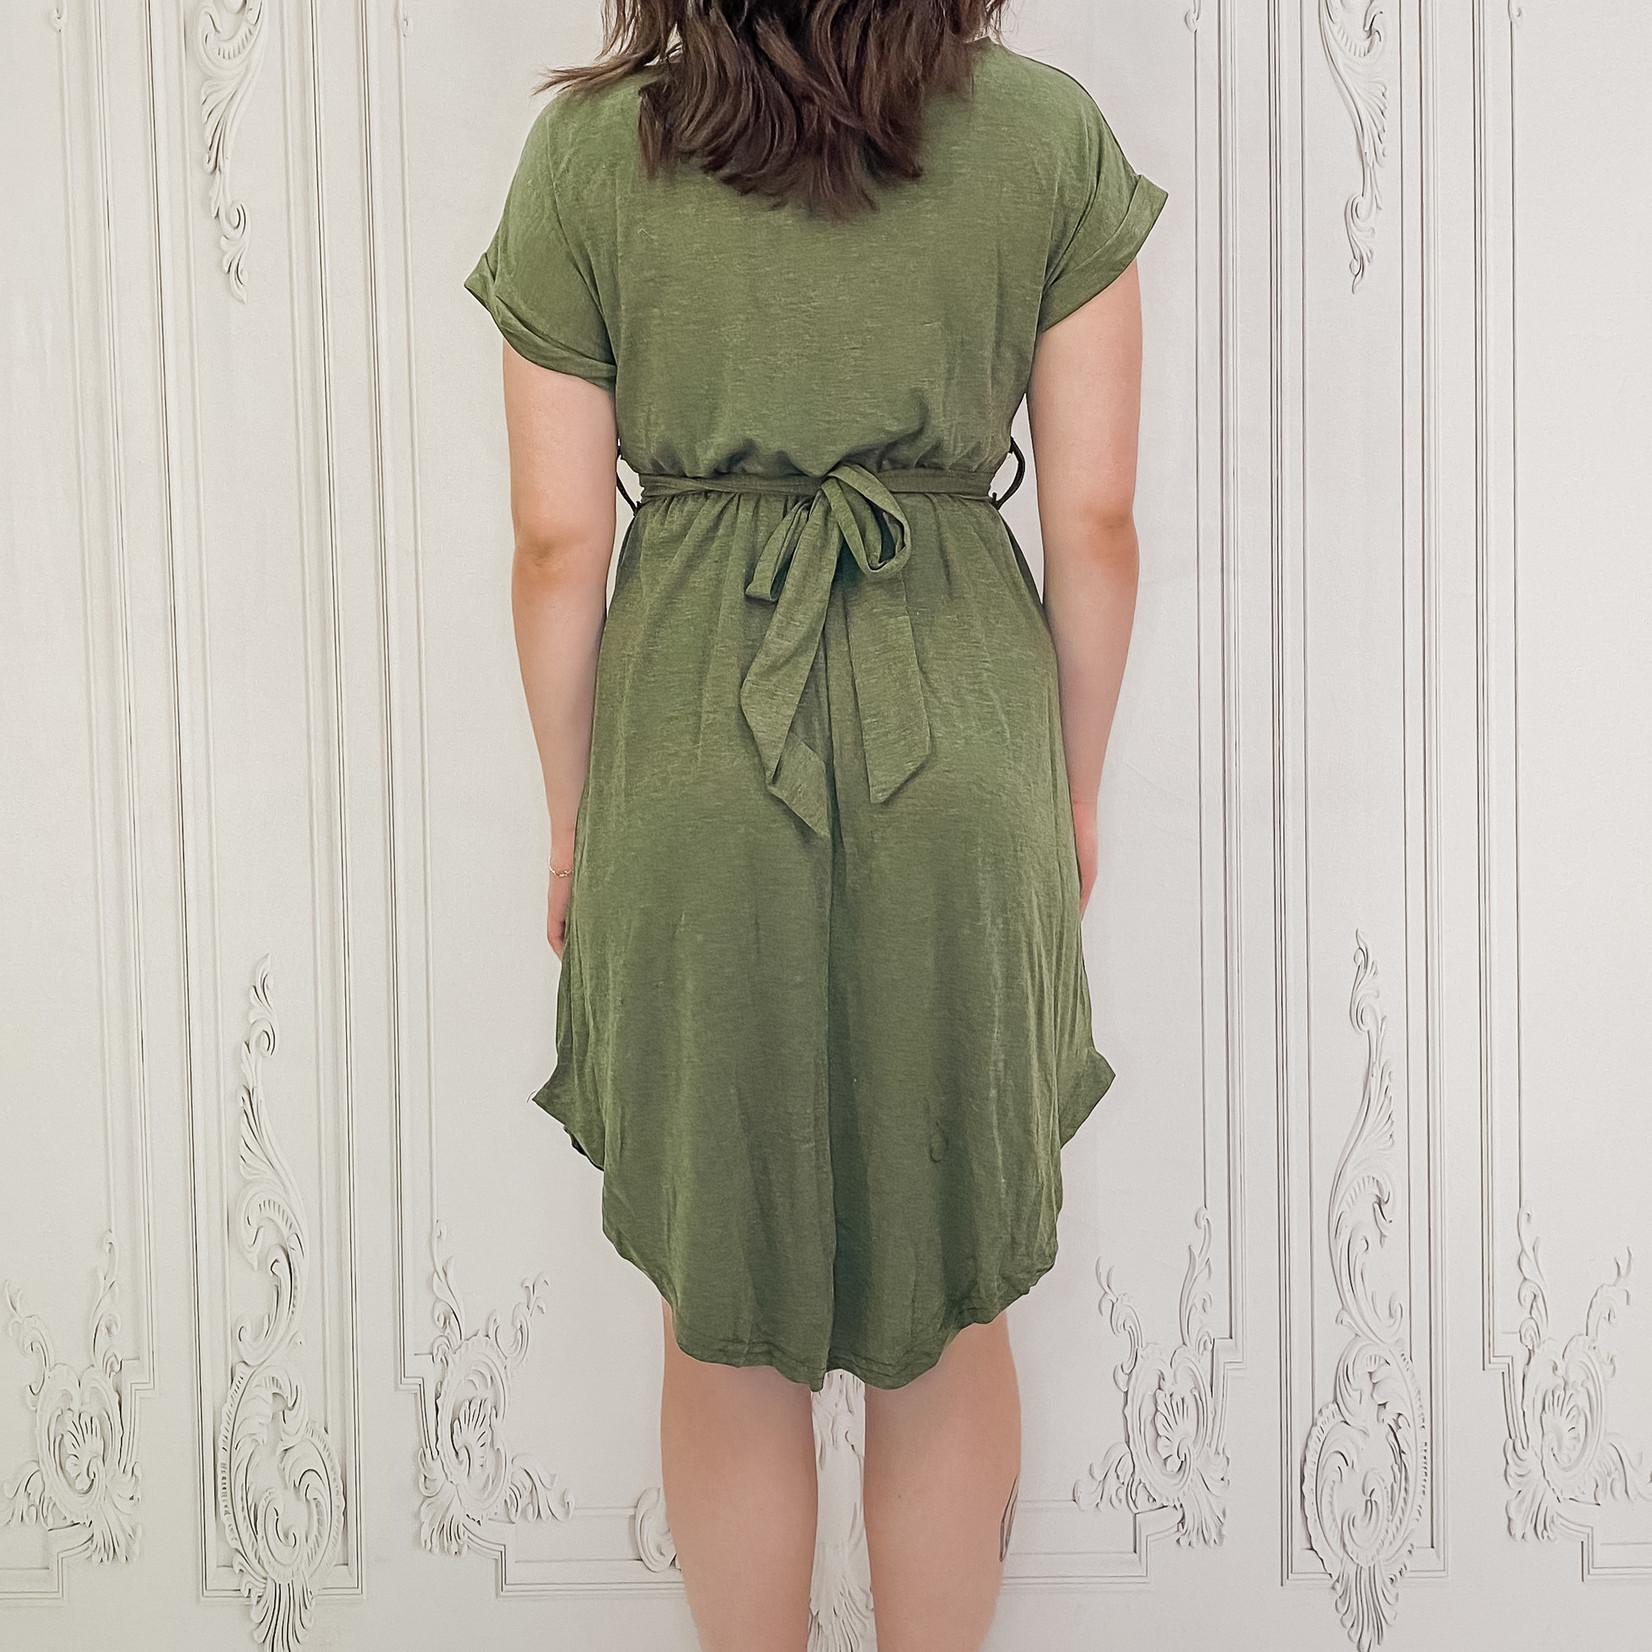 Sylvia cuffed sleeve t-shirt dress